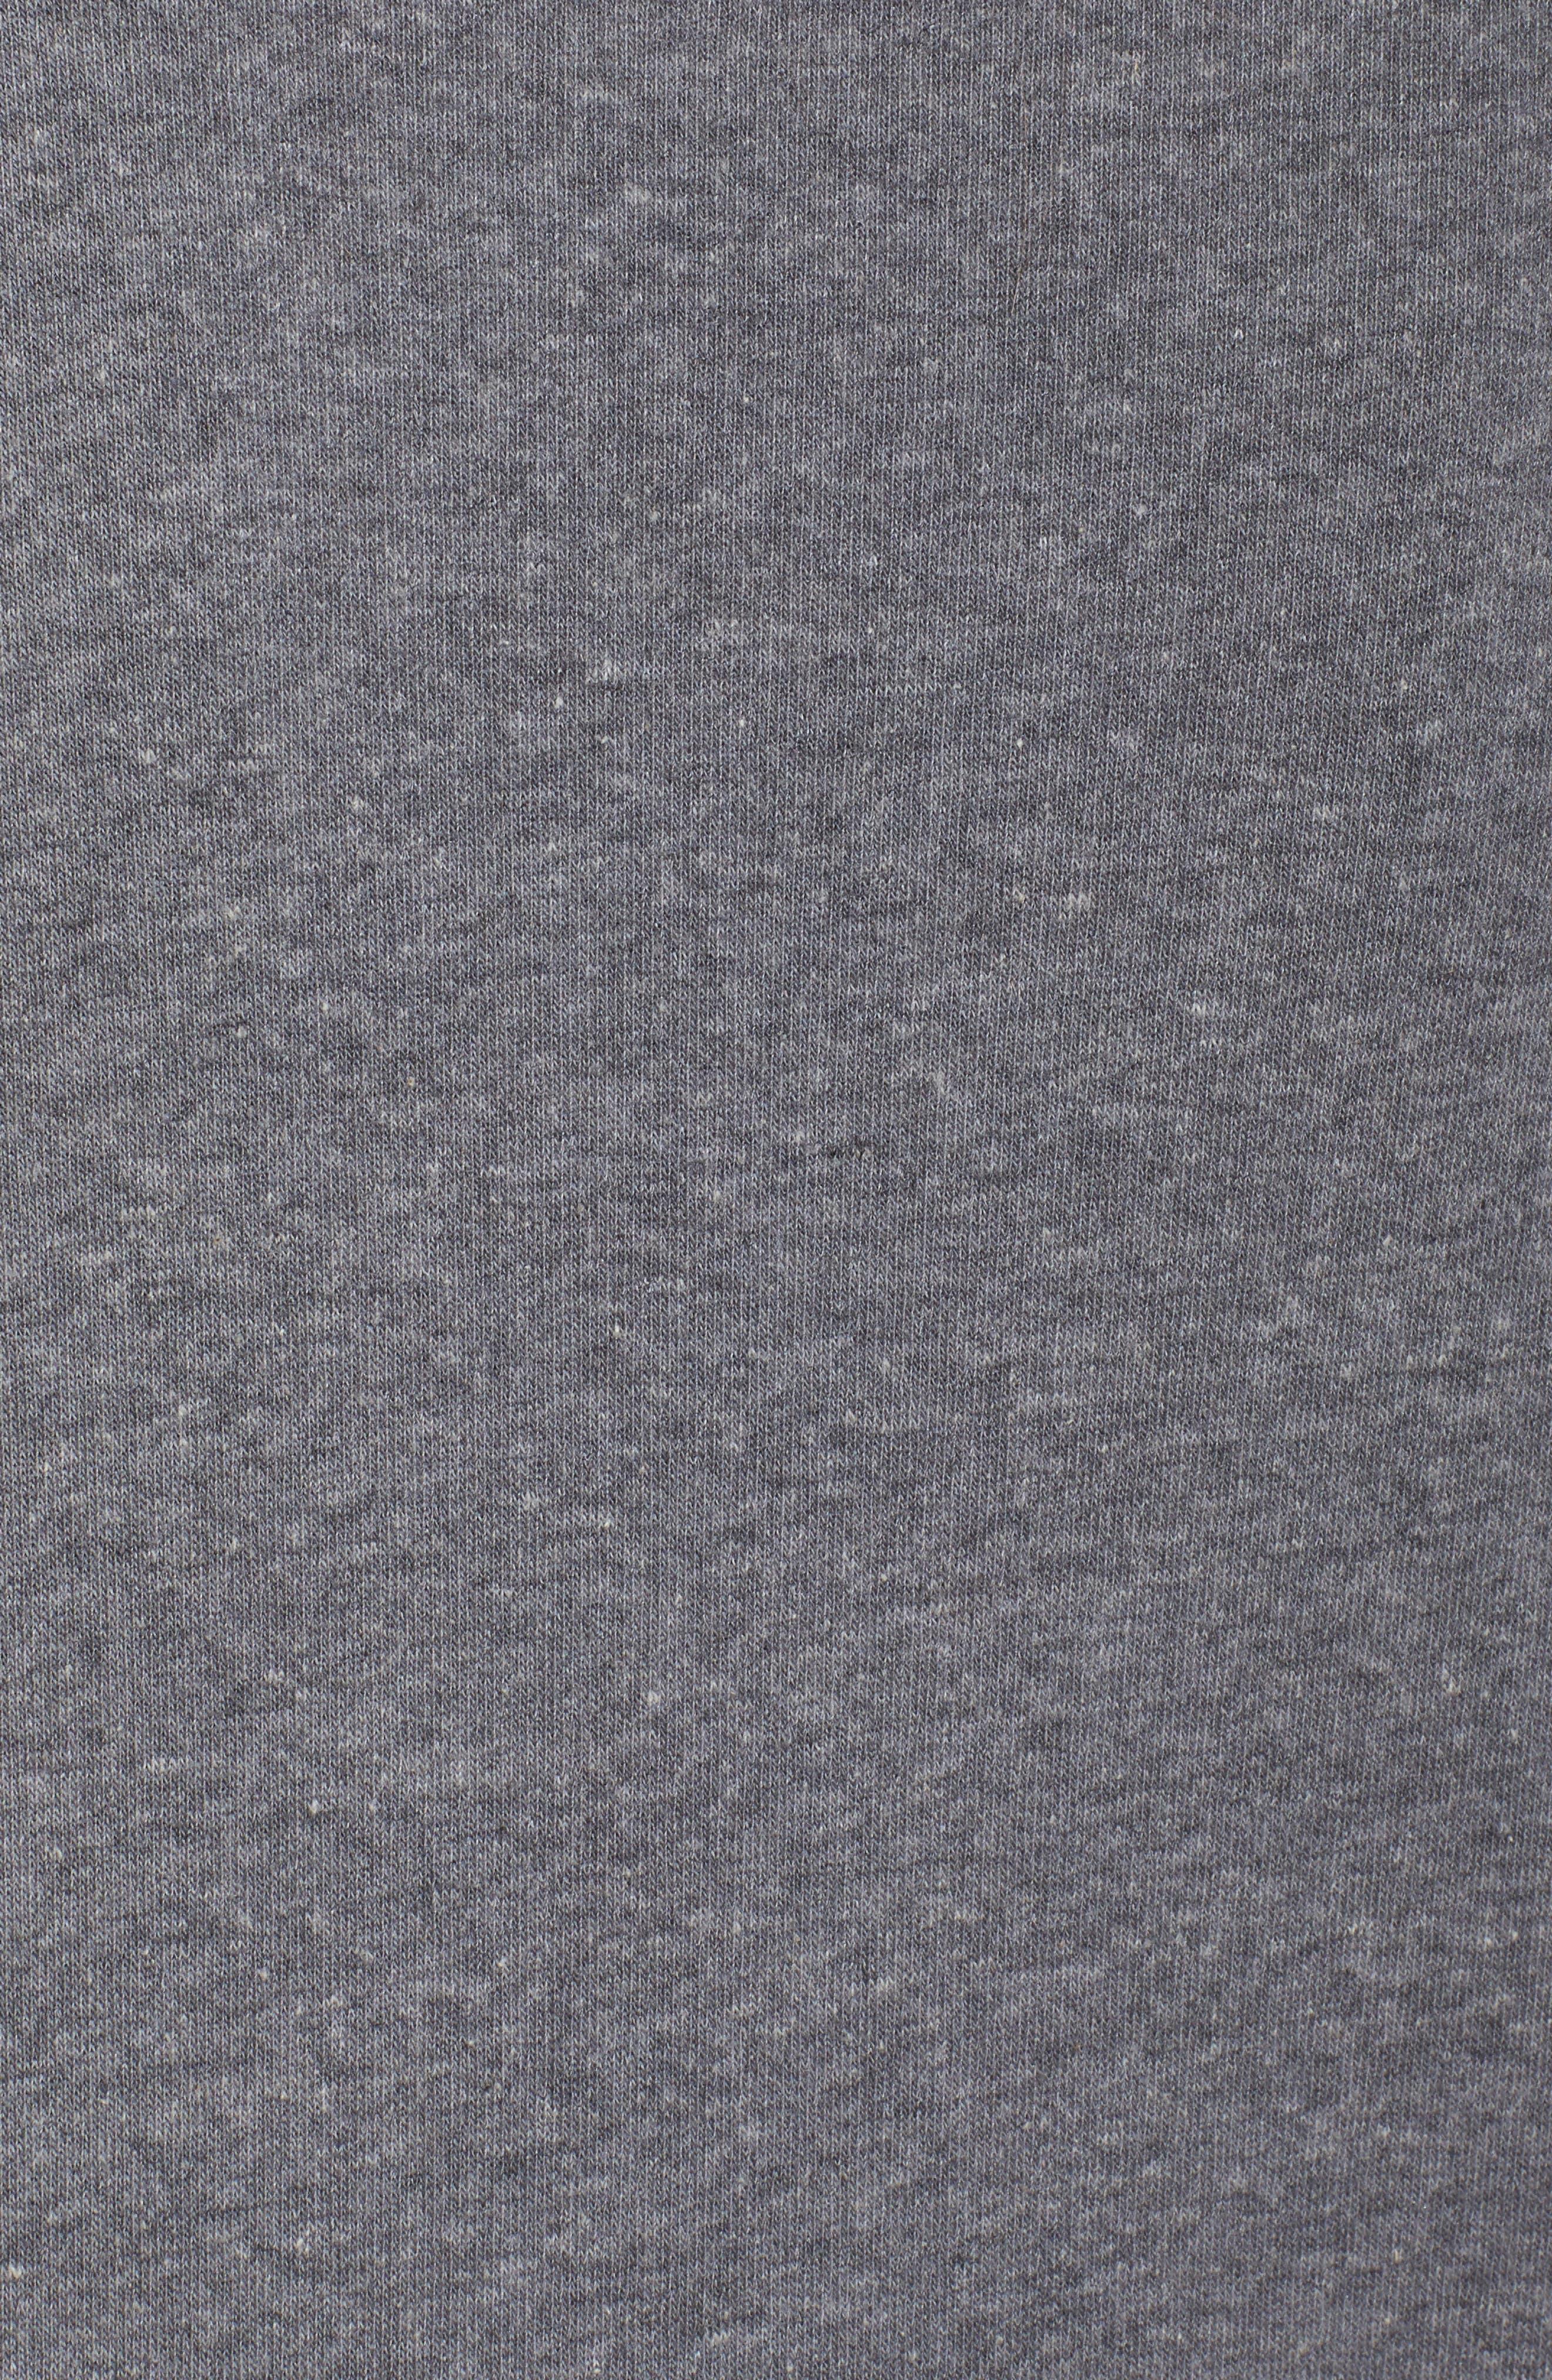 In Pizza We Crust Lounge Sweatshirt,                             Alternate thumbnail 5, color,                             020